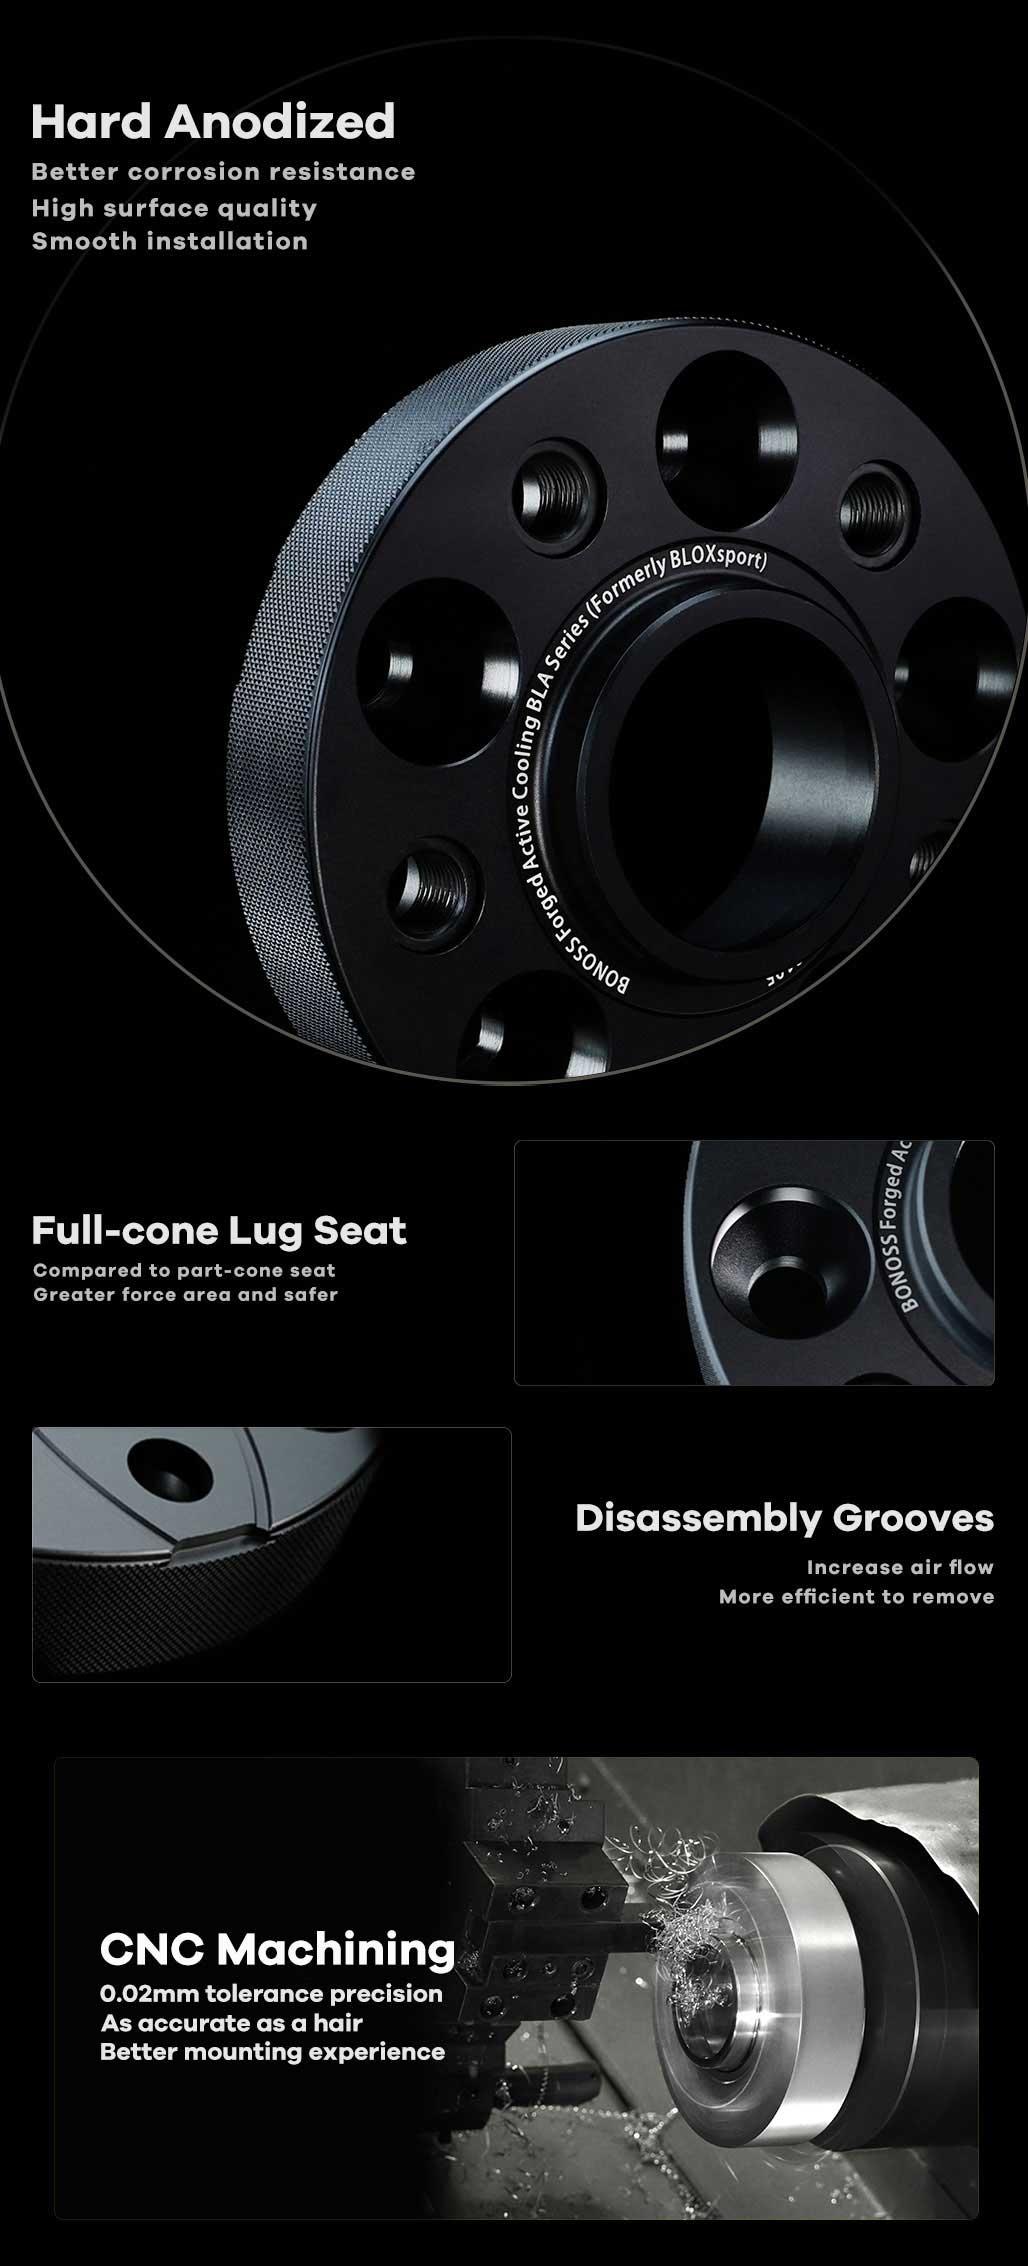 BONOSS-forged-active-cooling-5-Lug-wheel-spacers-(custom-wheel-spacers)-by-lulu-3